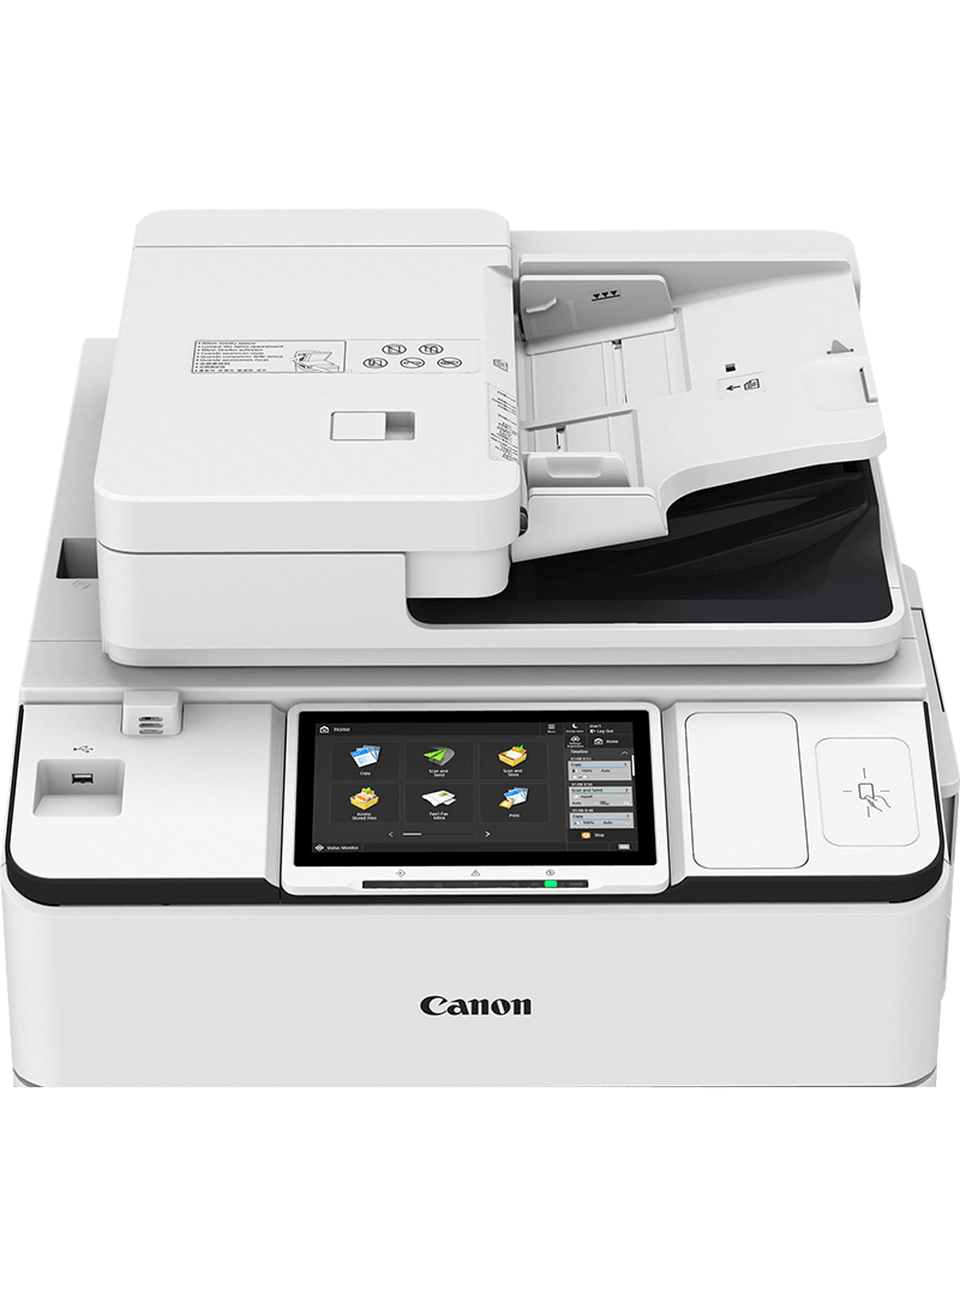 Canon DX 6700